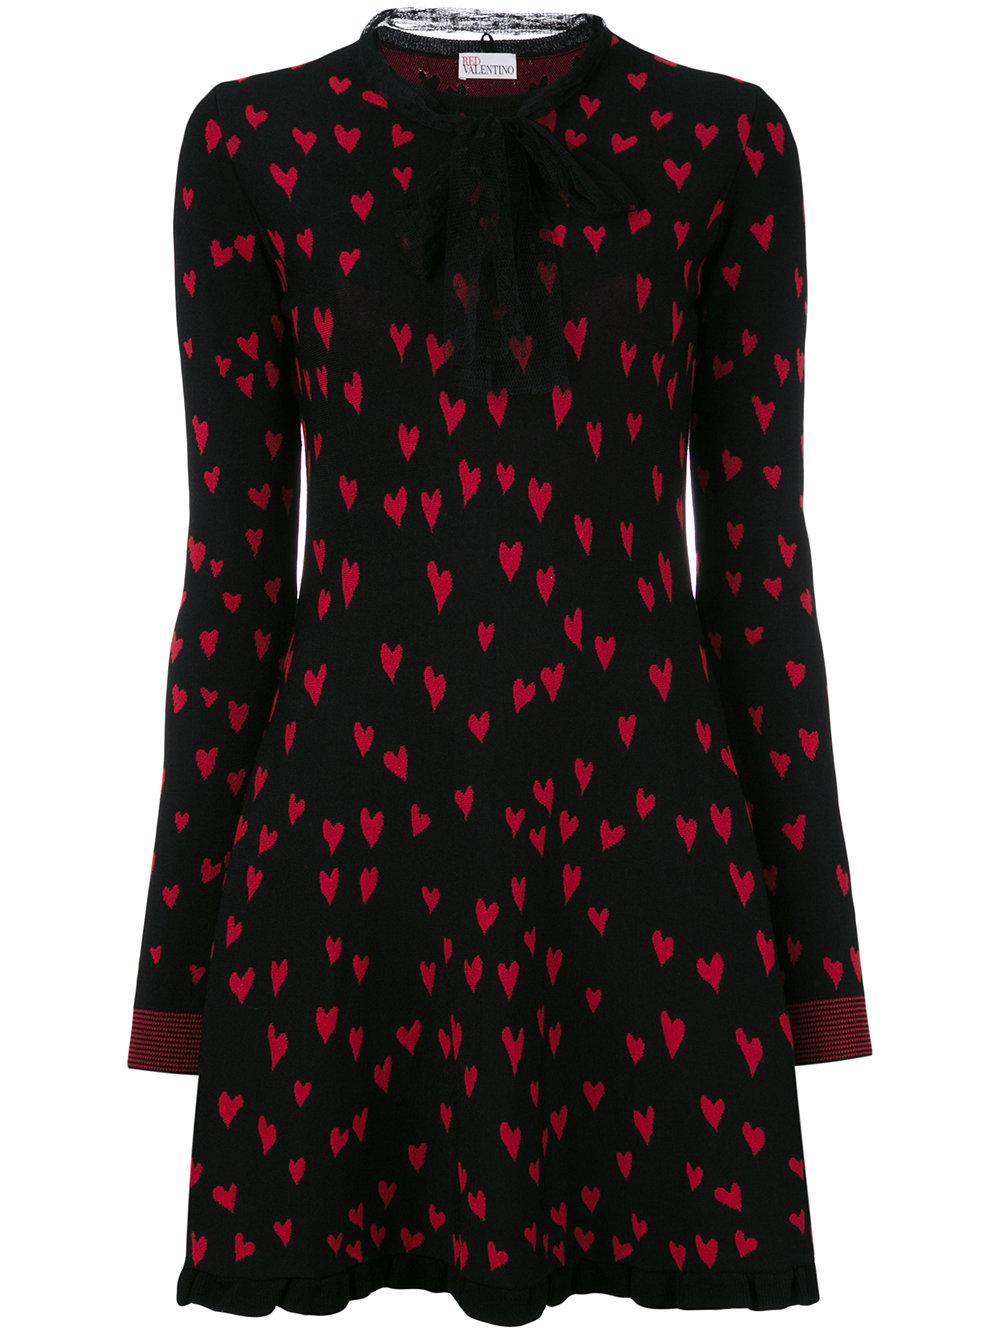 RED VALENTINO heart dress - $795